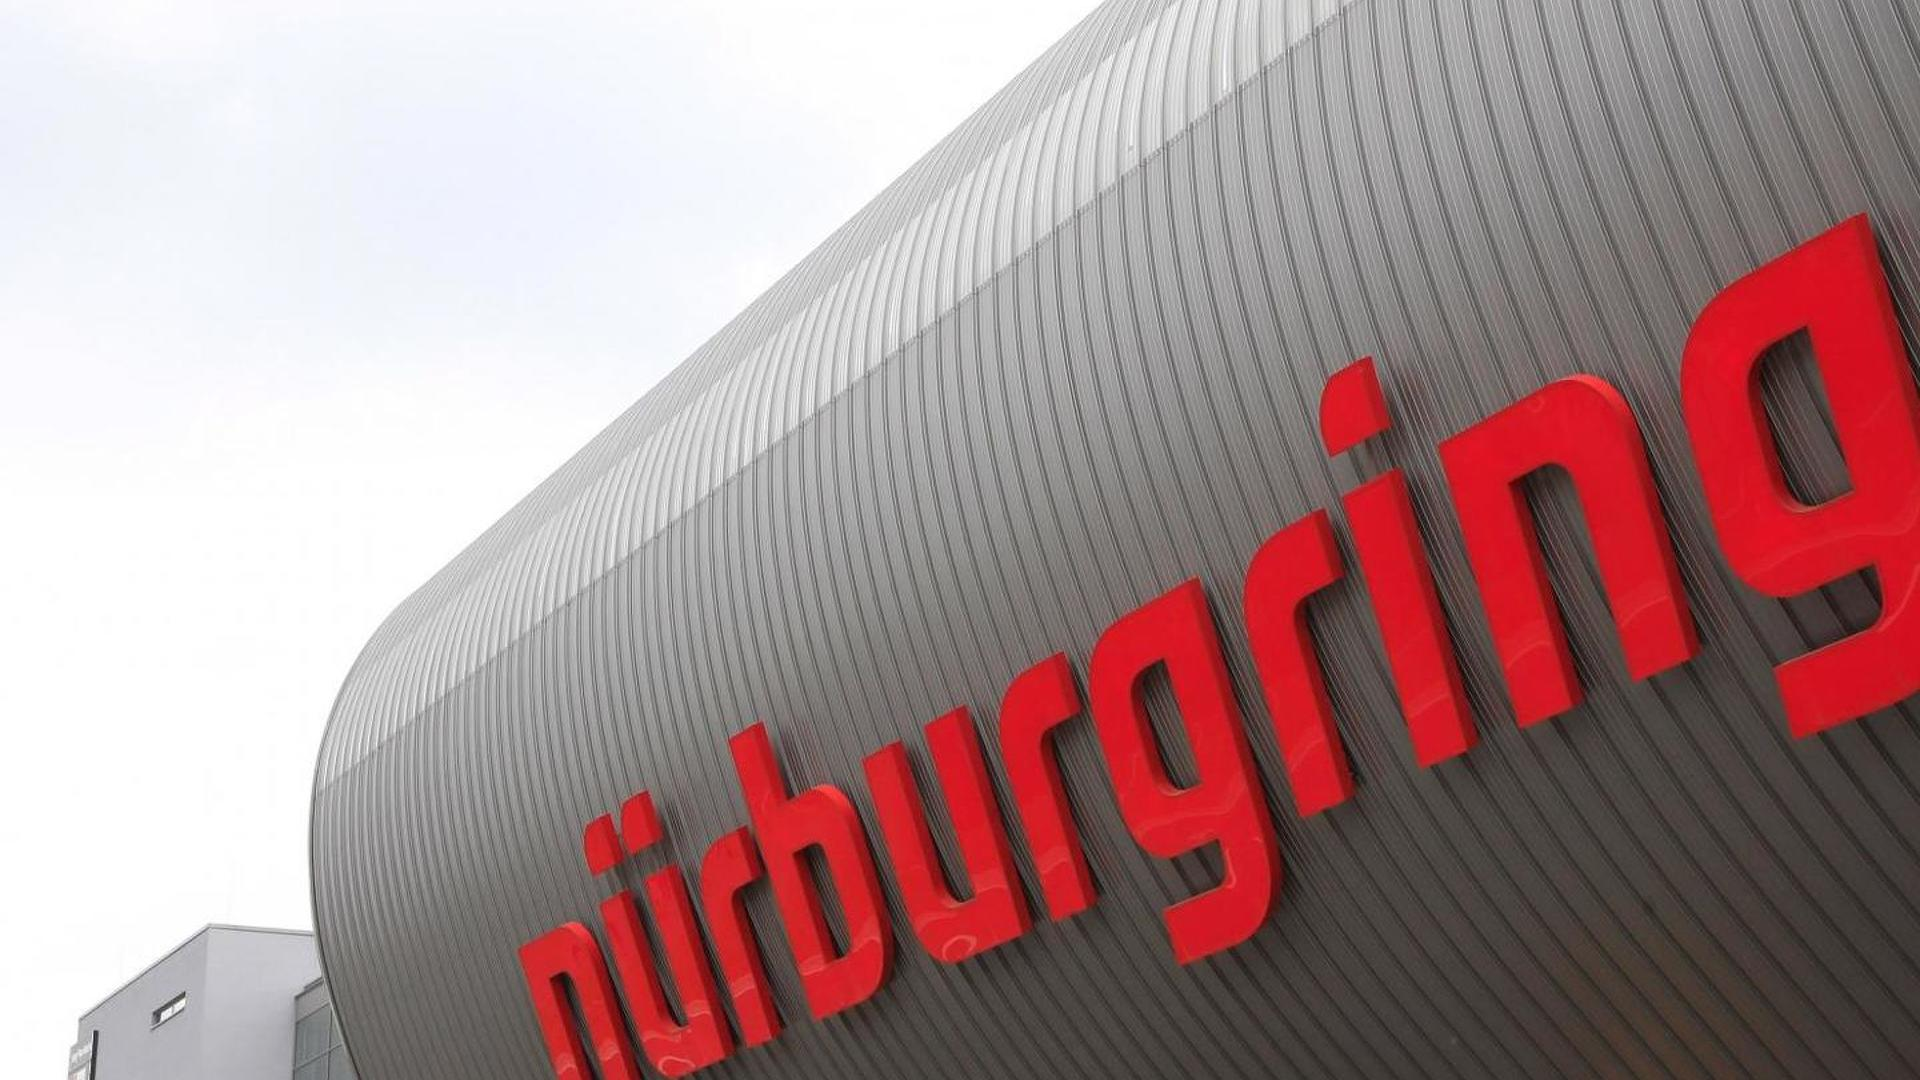 Nurburgring loses 2015 German grand prix